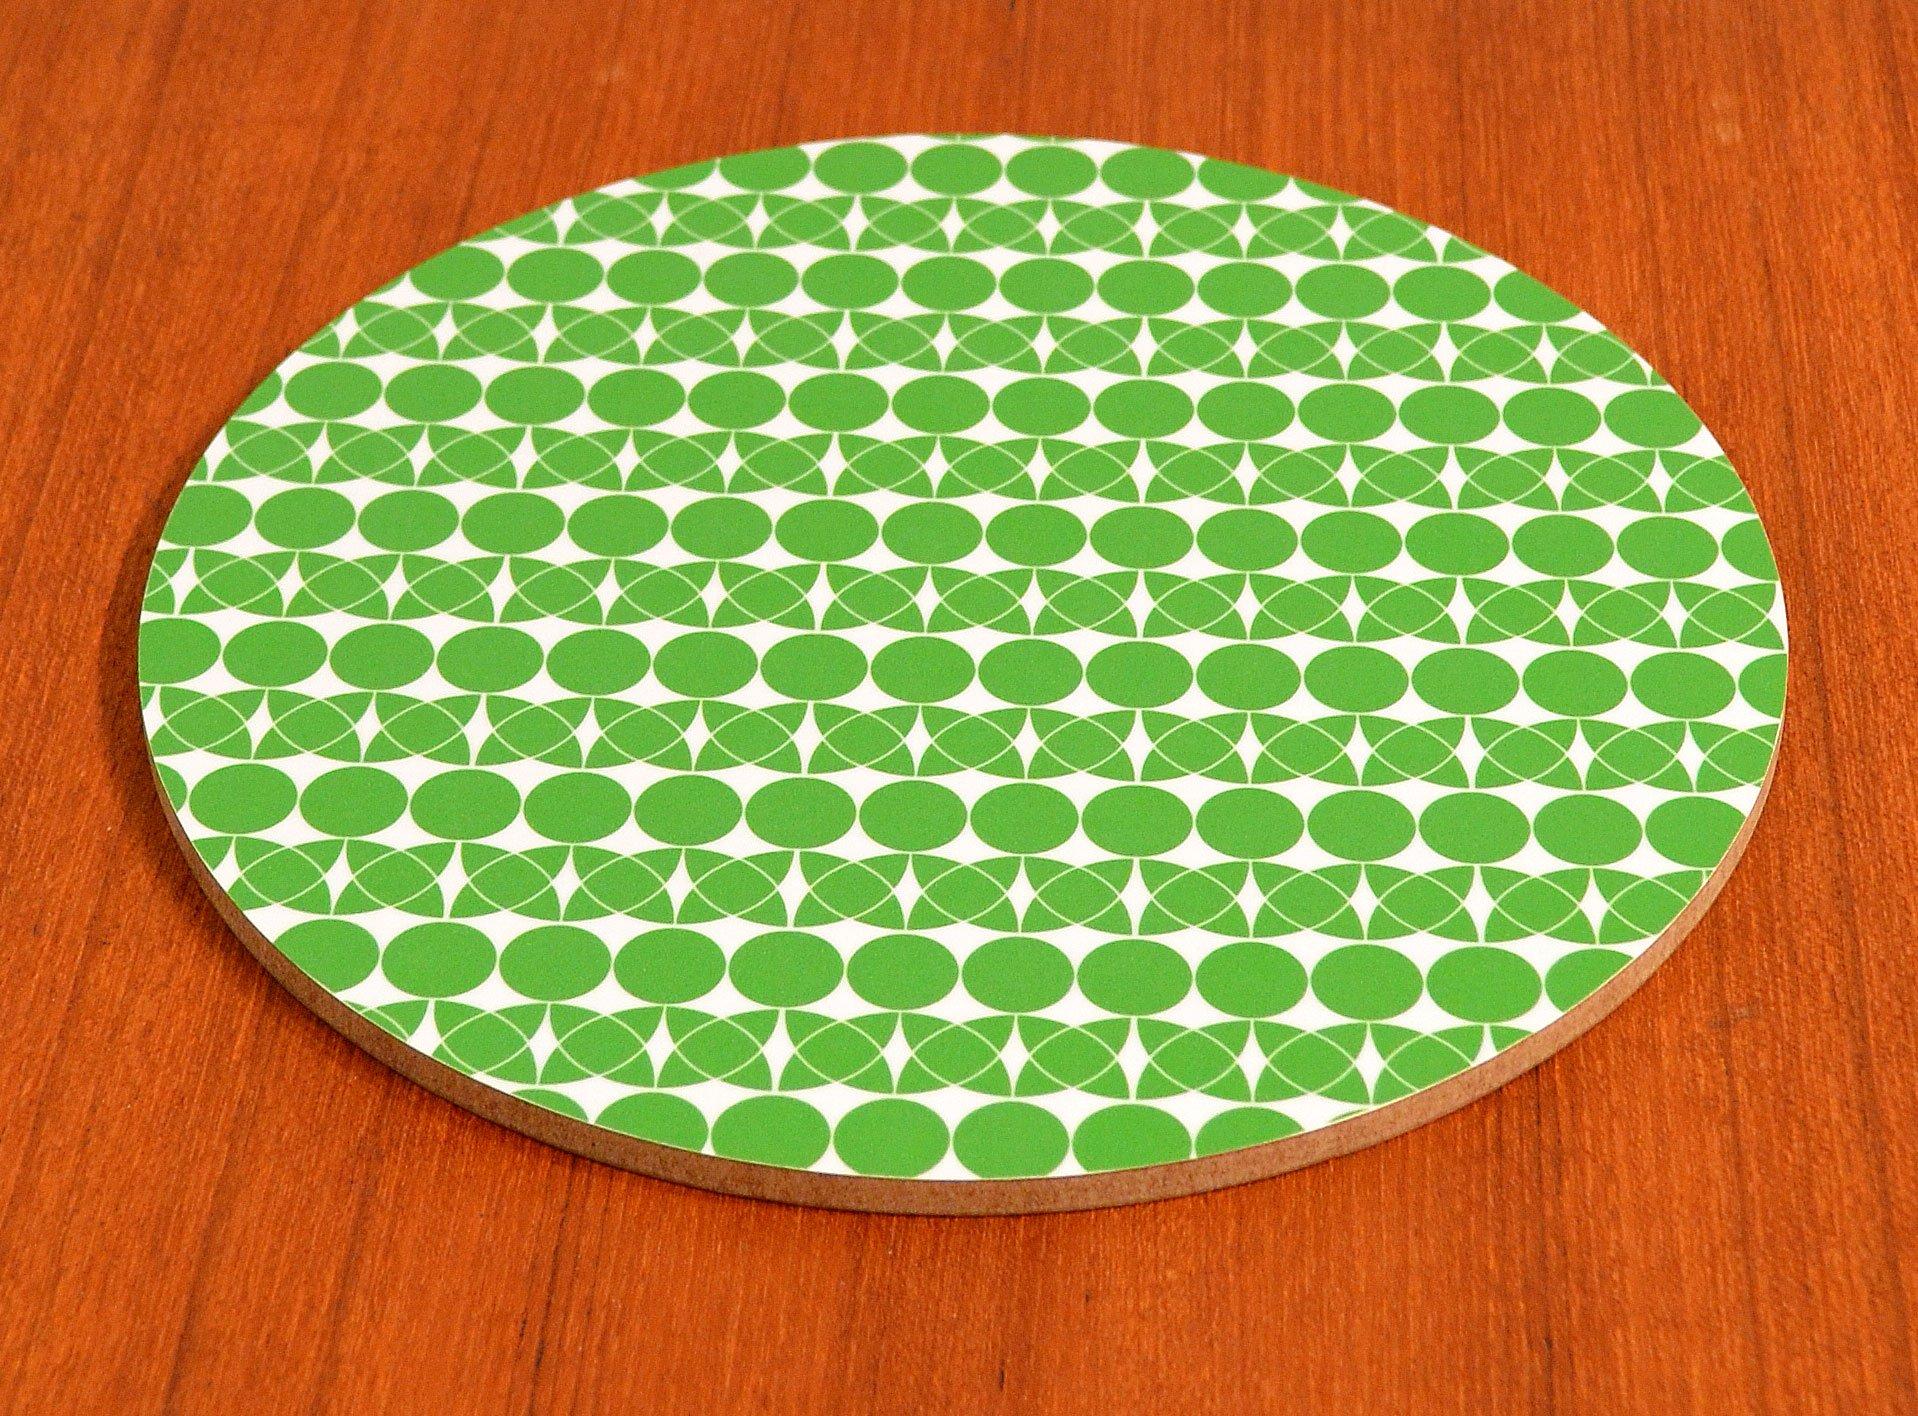 Grytunderlägg Cirkel/blad, grönt